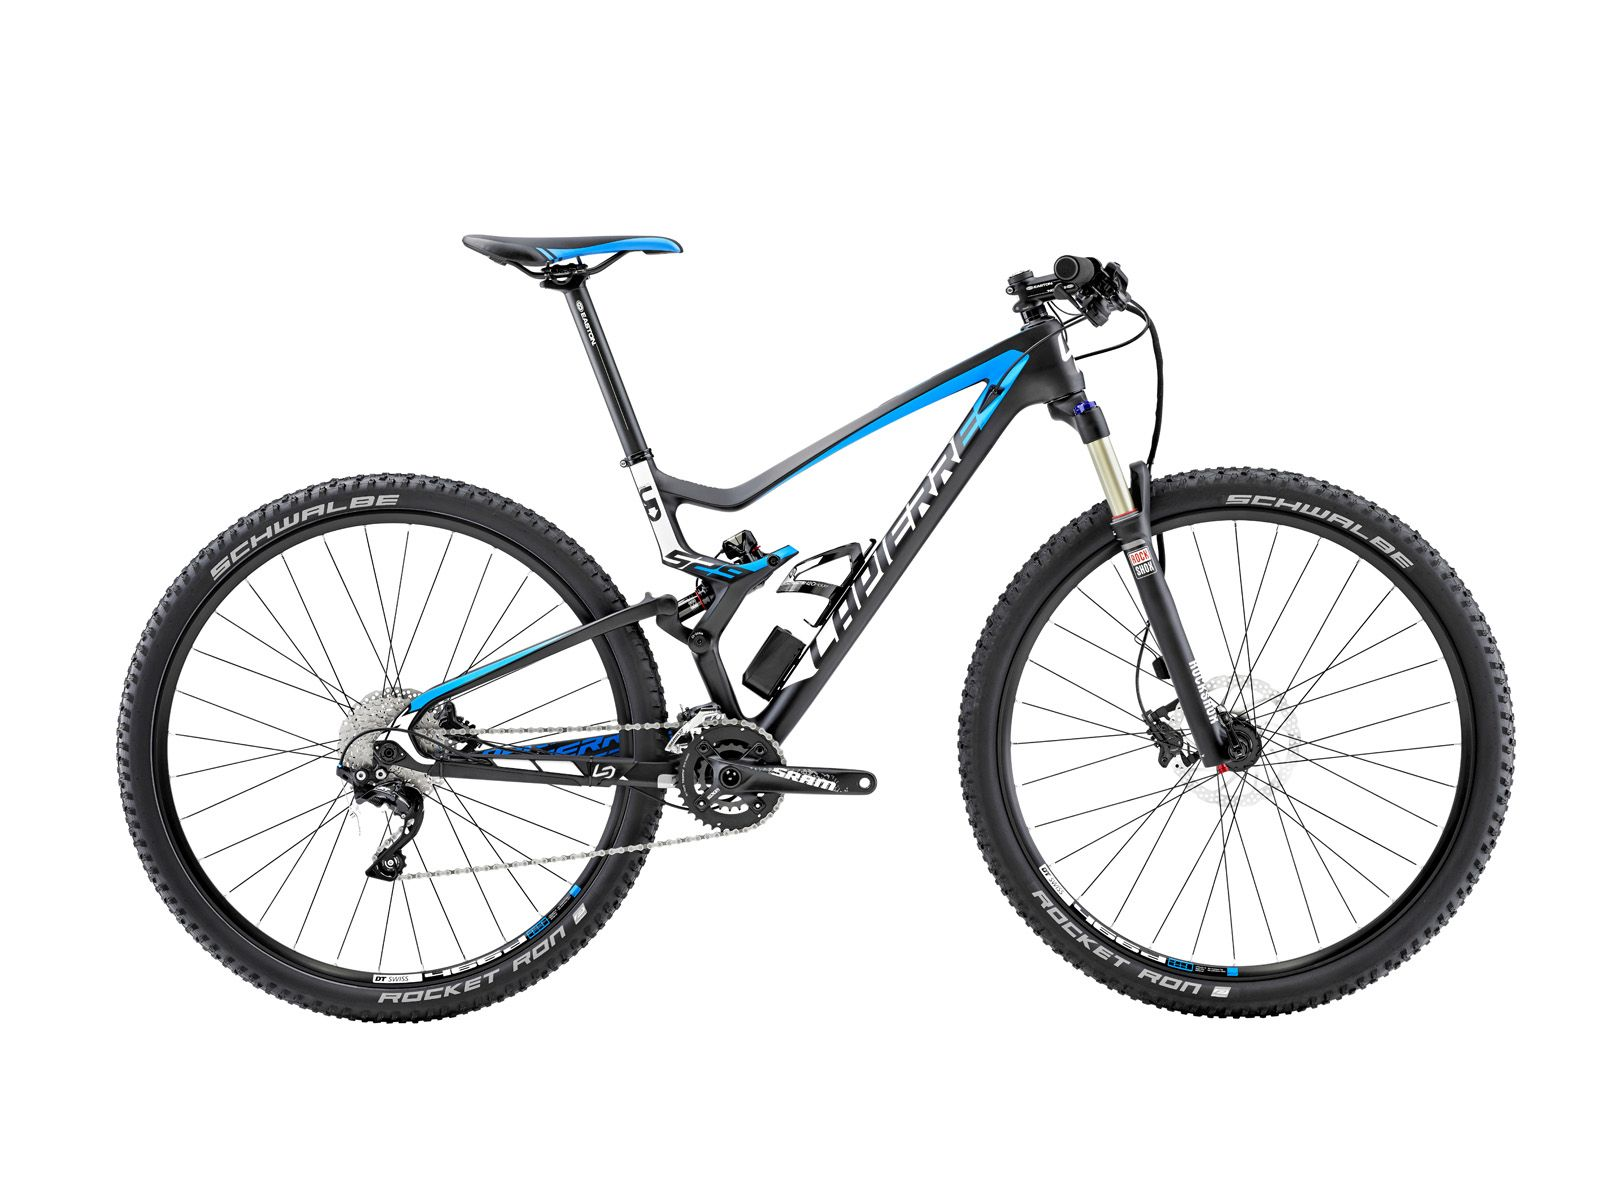 2015 Lapierre XR529